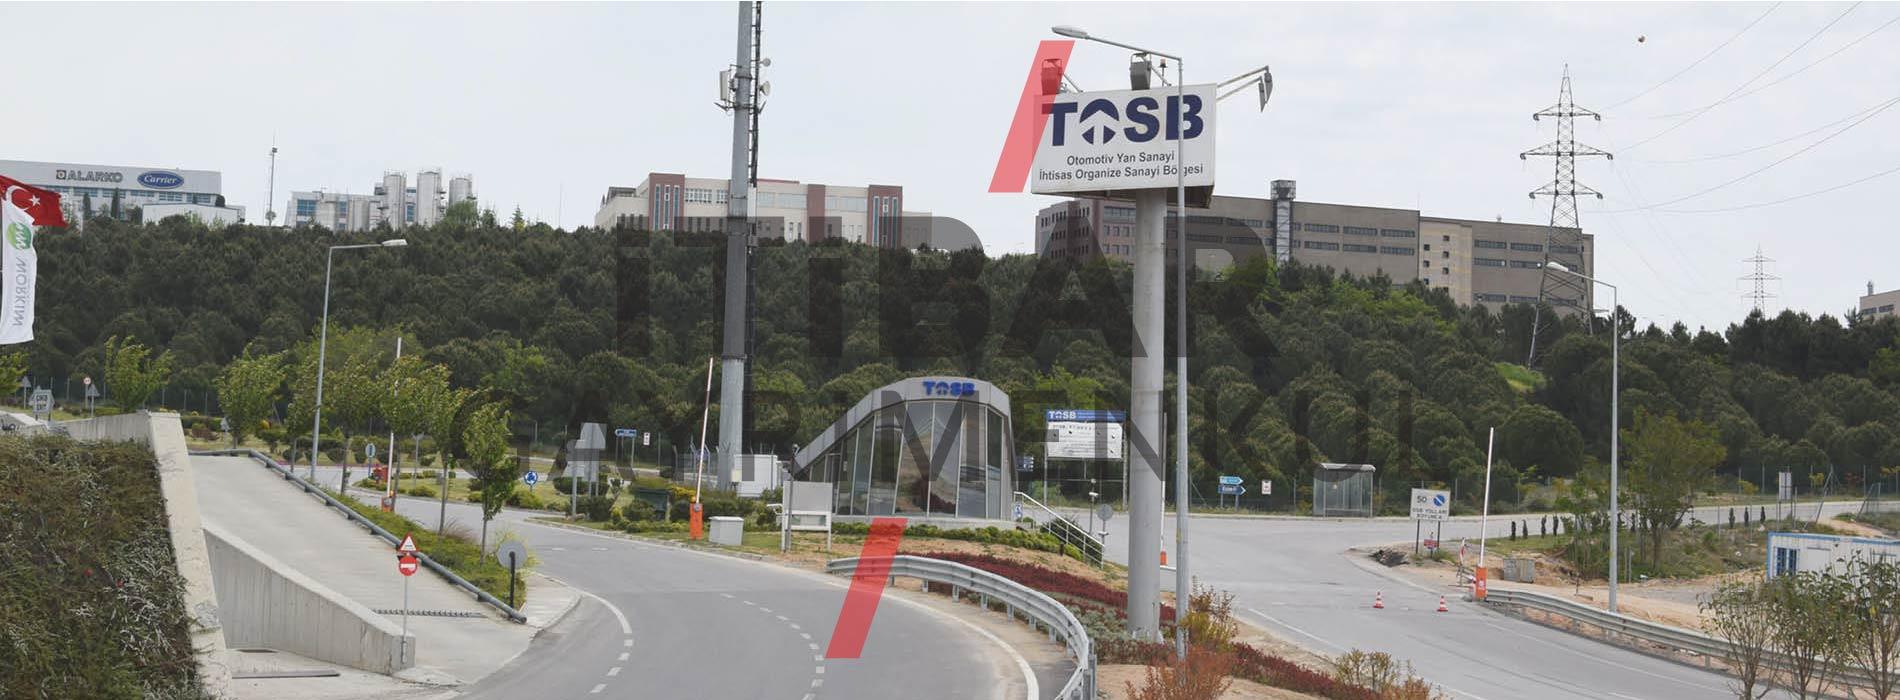 TOSB OTOMOTİV YAN SANAYİ İHTİSAS